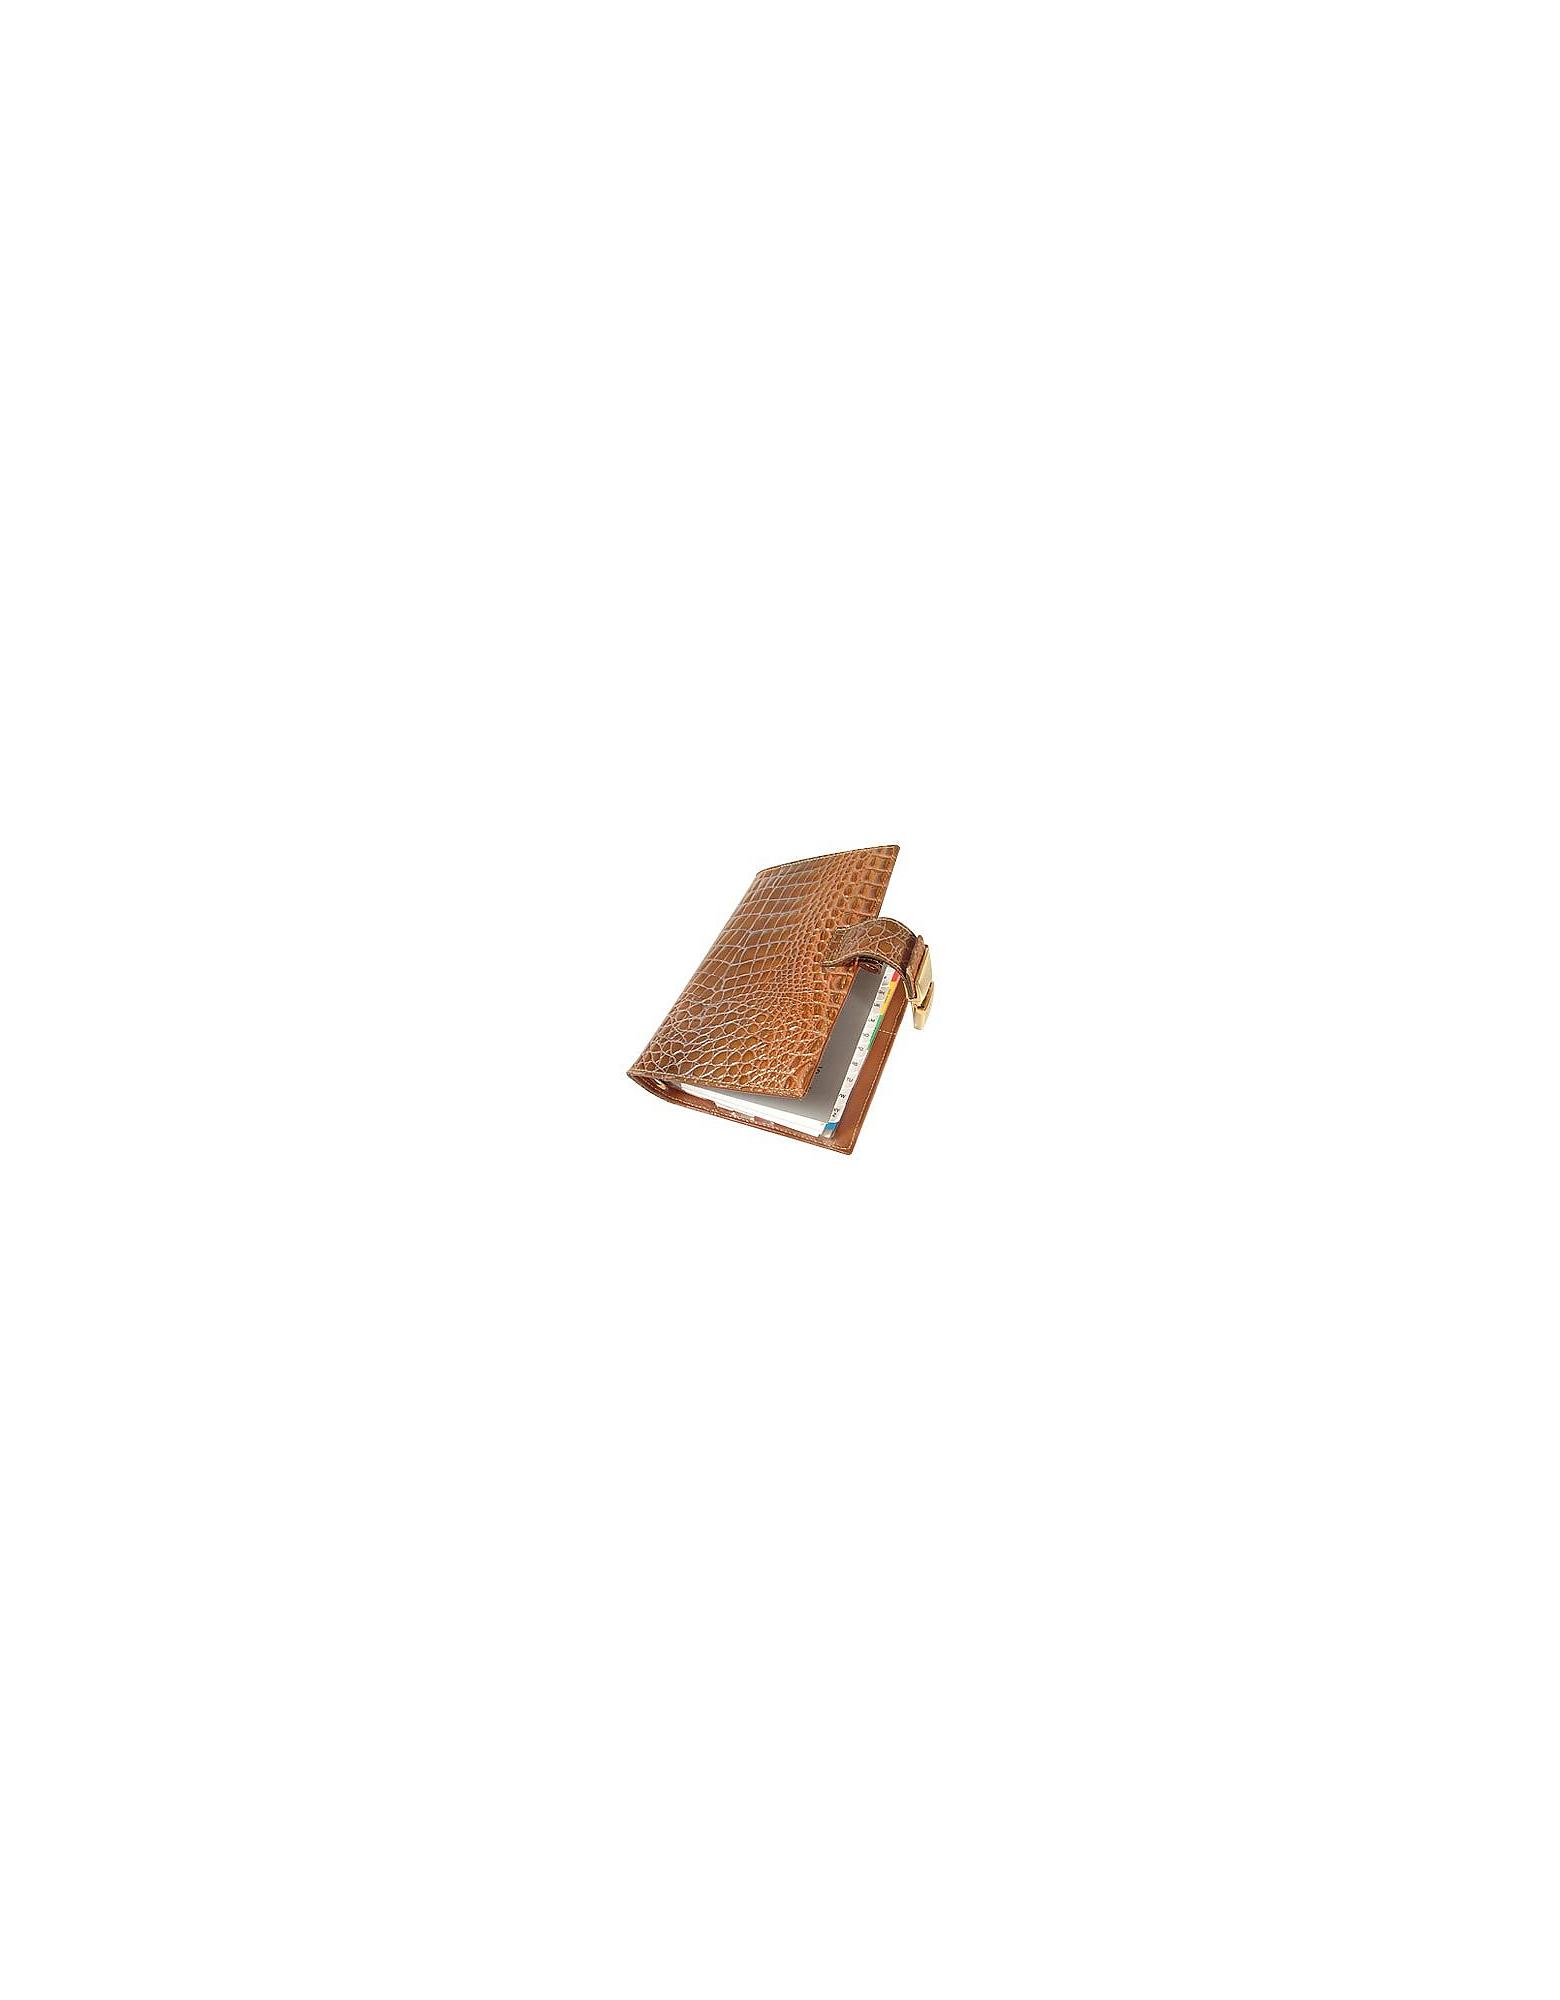 Forzieri Desk Accessories, Stamped Alligator Leather Planner